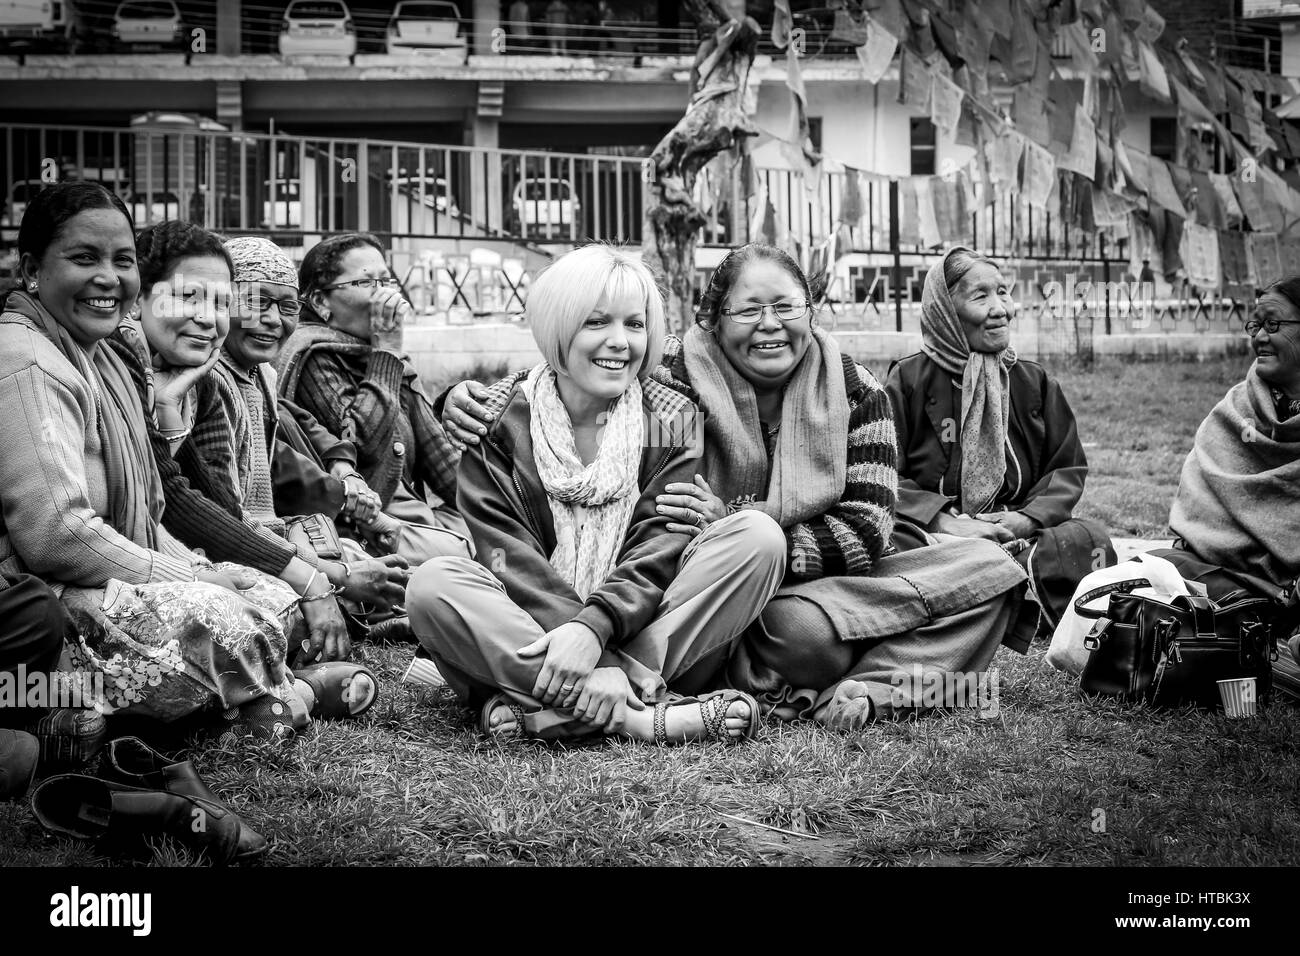 Tibetan women sitting with tourist smiling - Stock Image